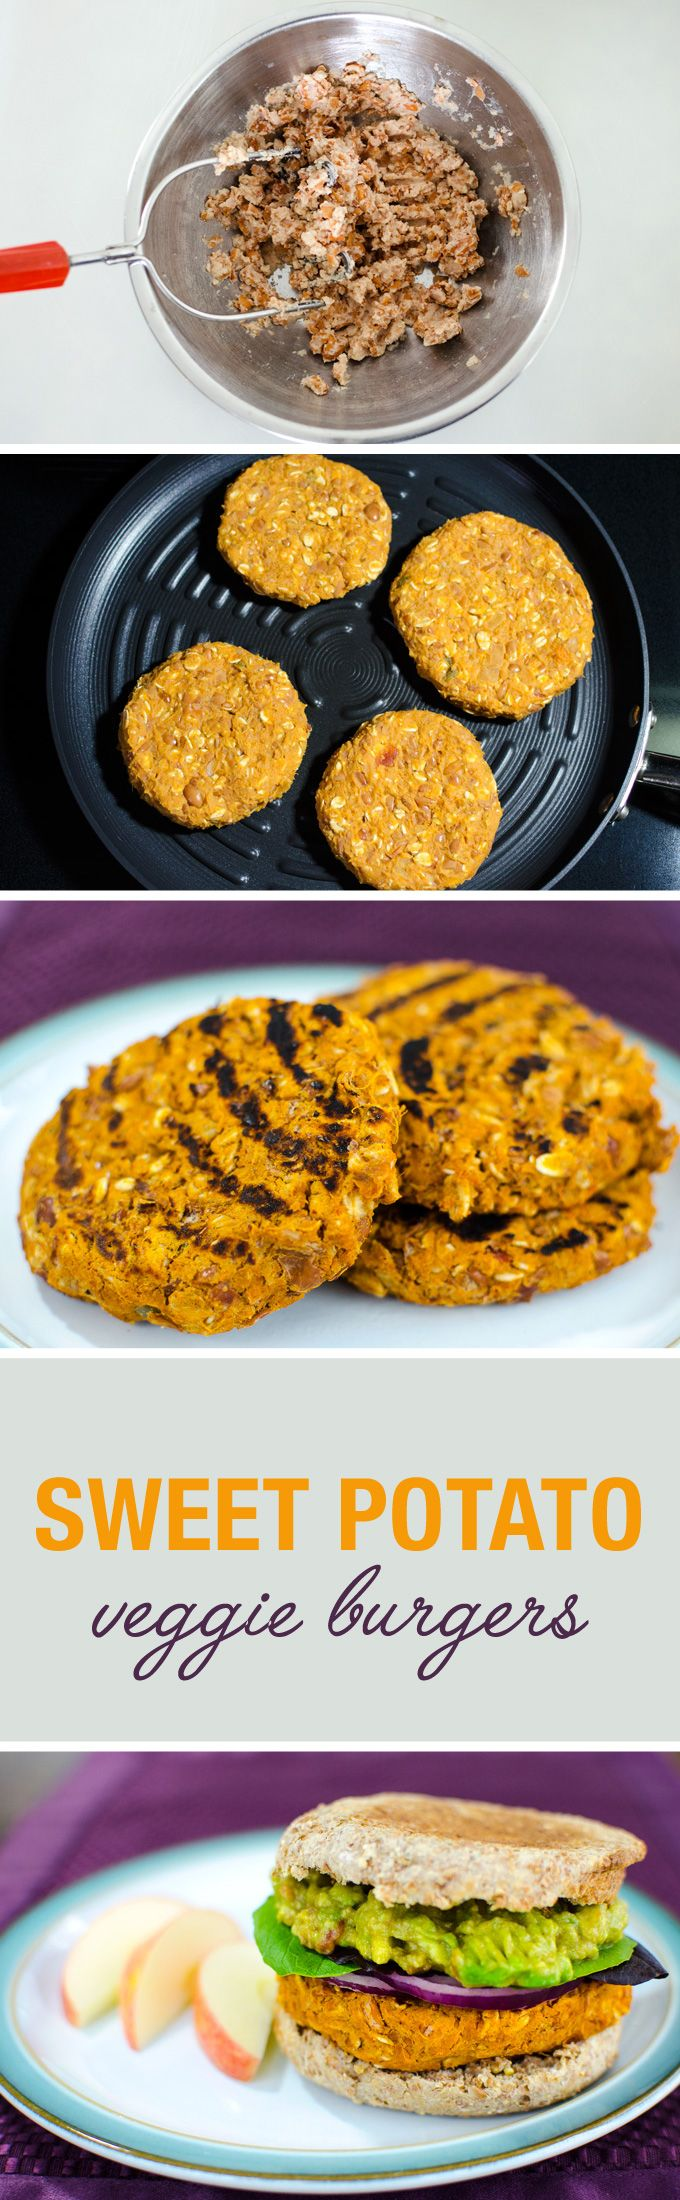 Sweet Potato Veggie Burgers with quick guacamole | VeggiePrimer.com #veggieburgers #glutenfree